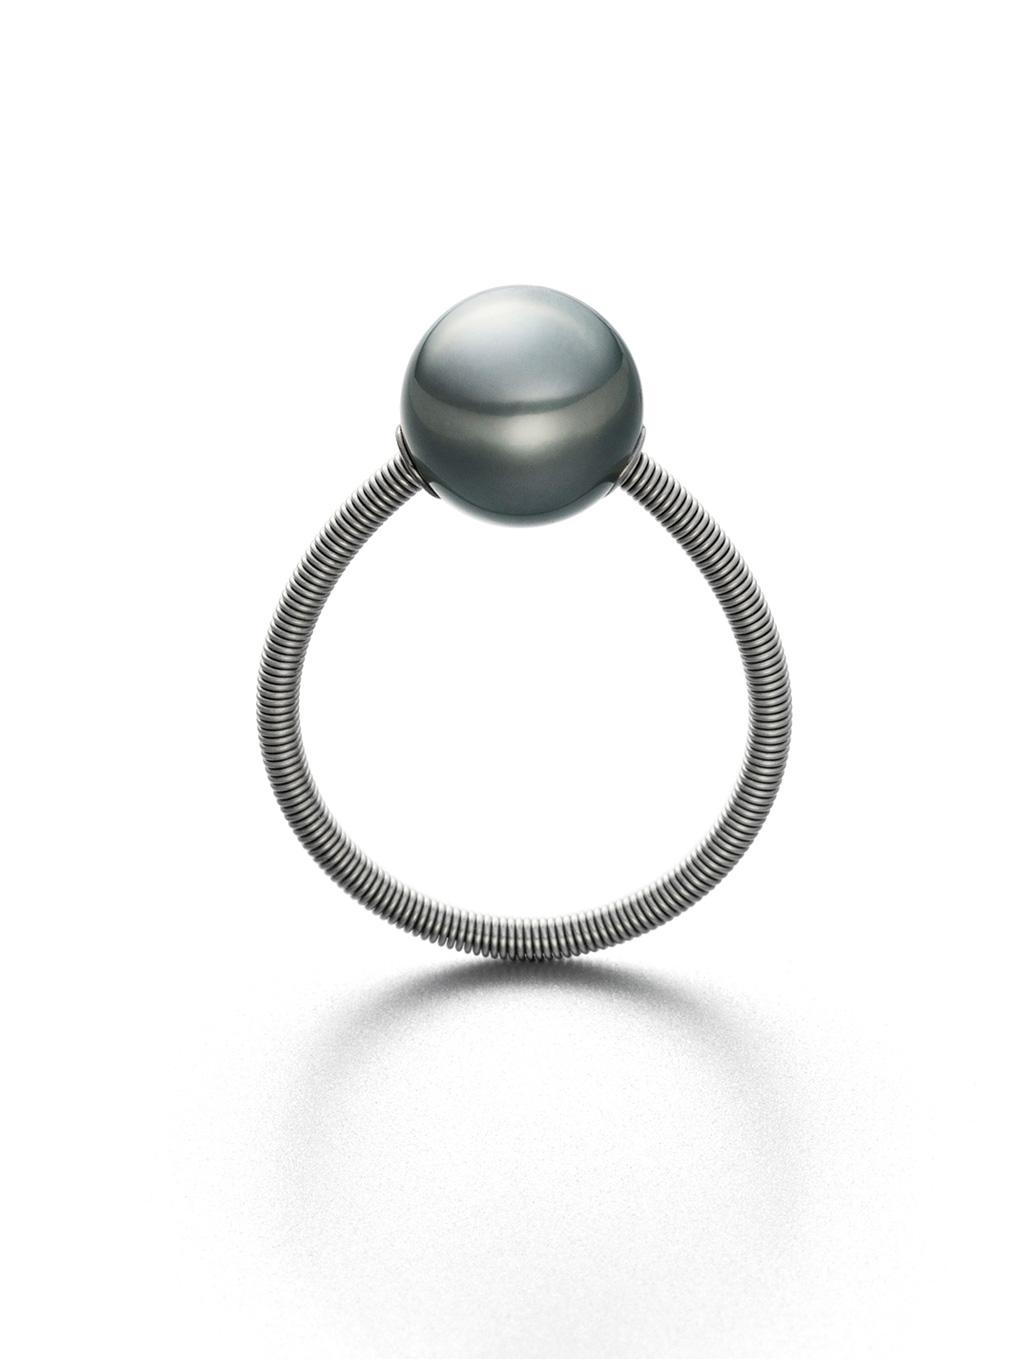 ring one tahiti, tahitiperle, softspirale aus edelstahl